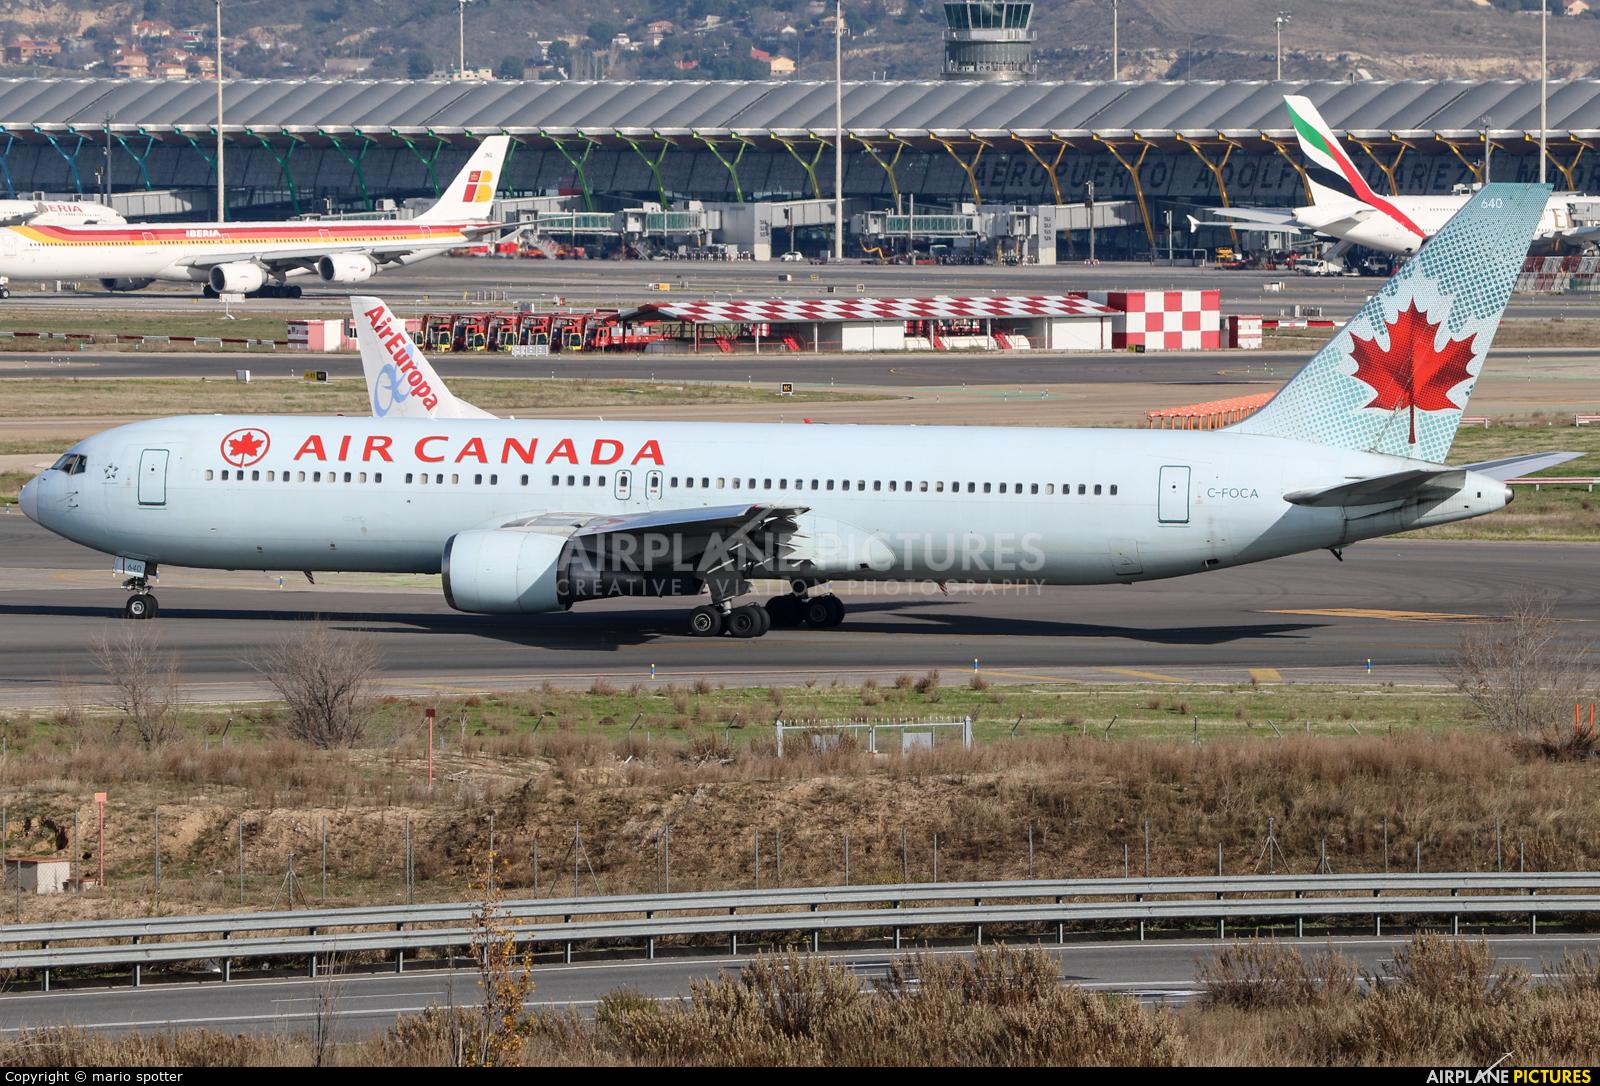 Air Canada C-FOCA aircraft at Madrid - Barajas